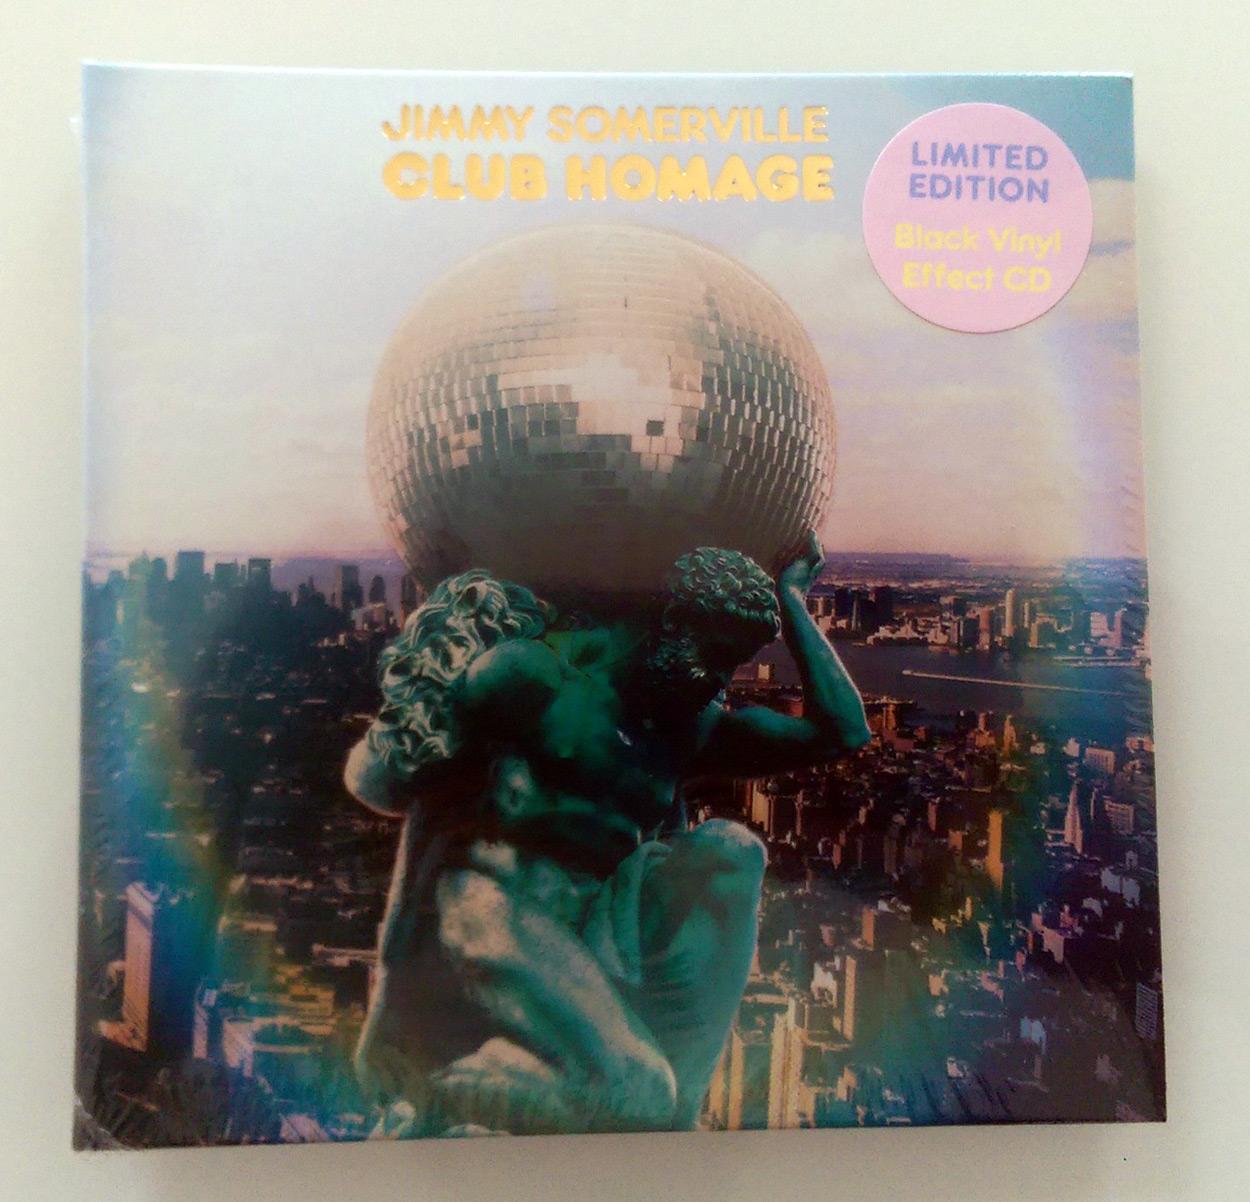 Jimmy Somerville / Club Homage remix compilation